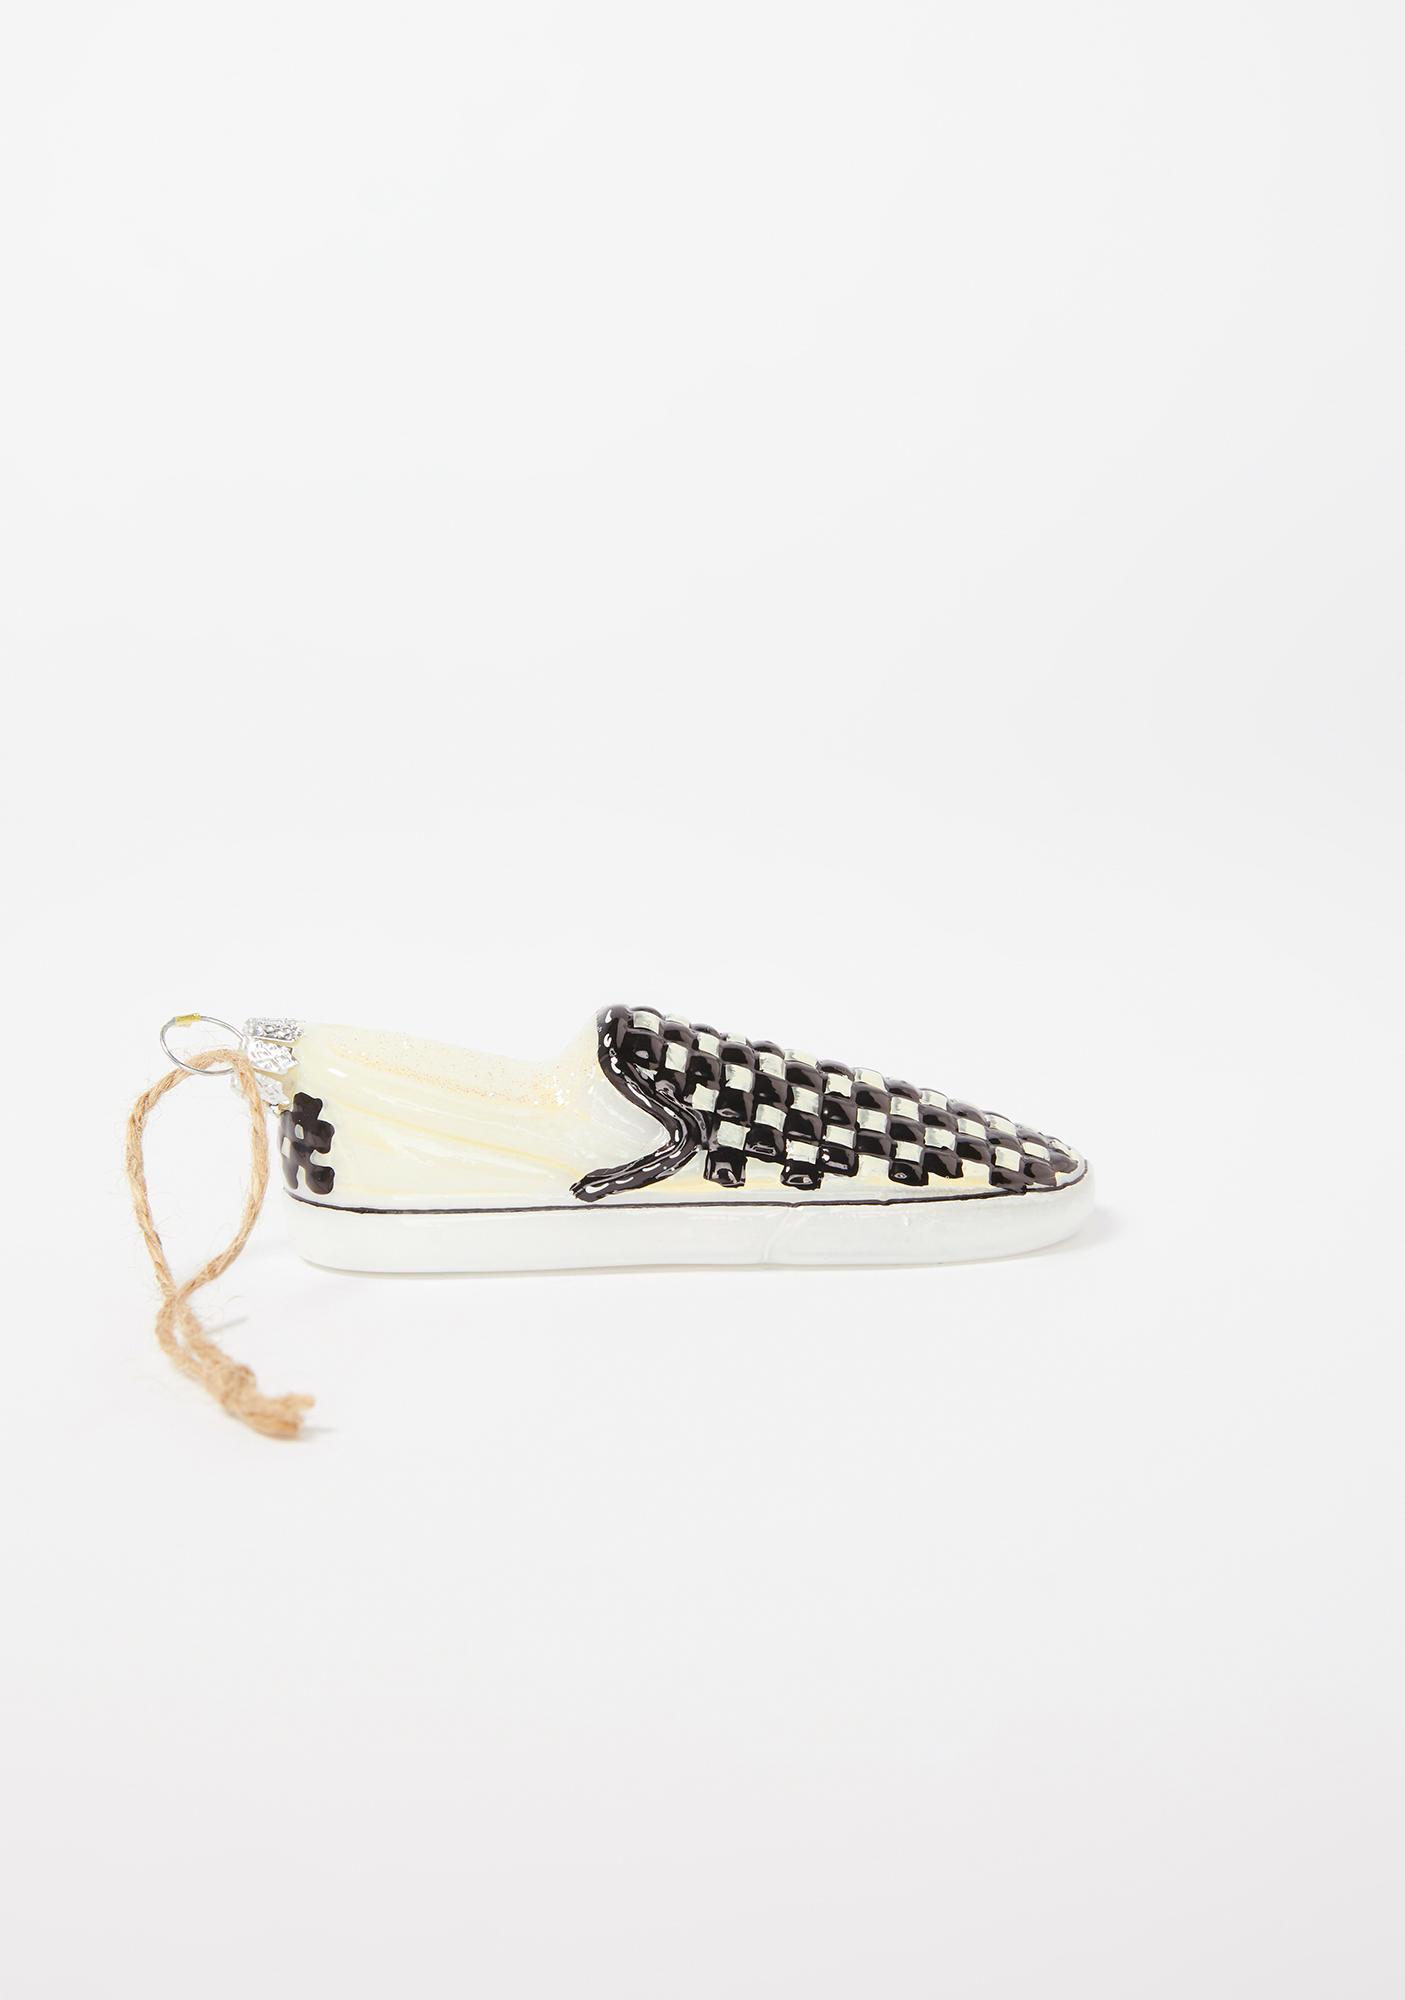 Santa's Sneakers Checkered Shoe Ornament